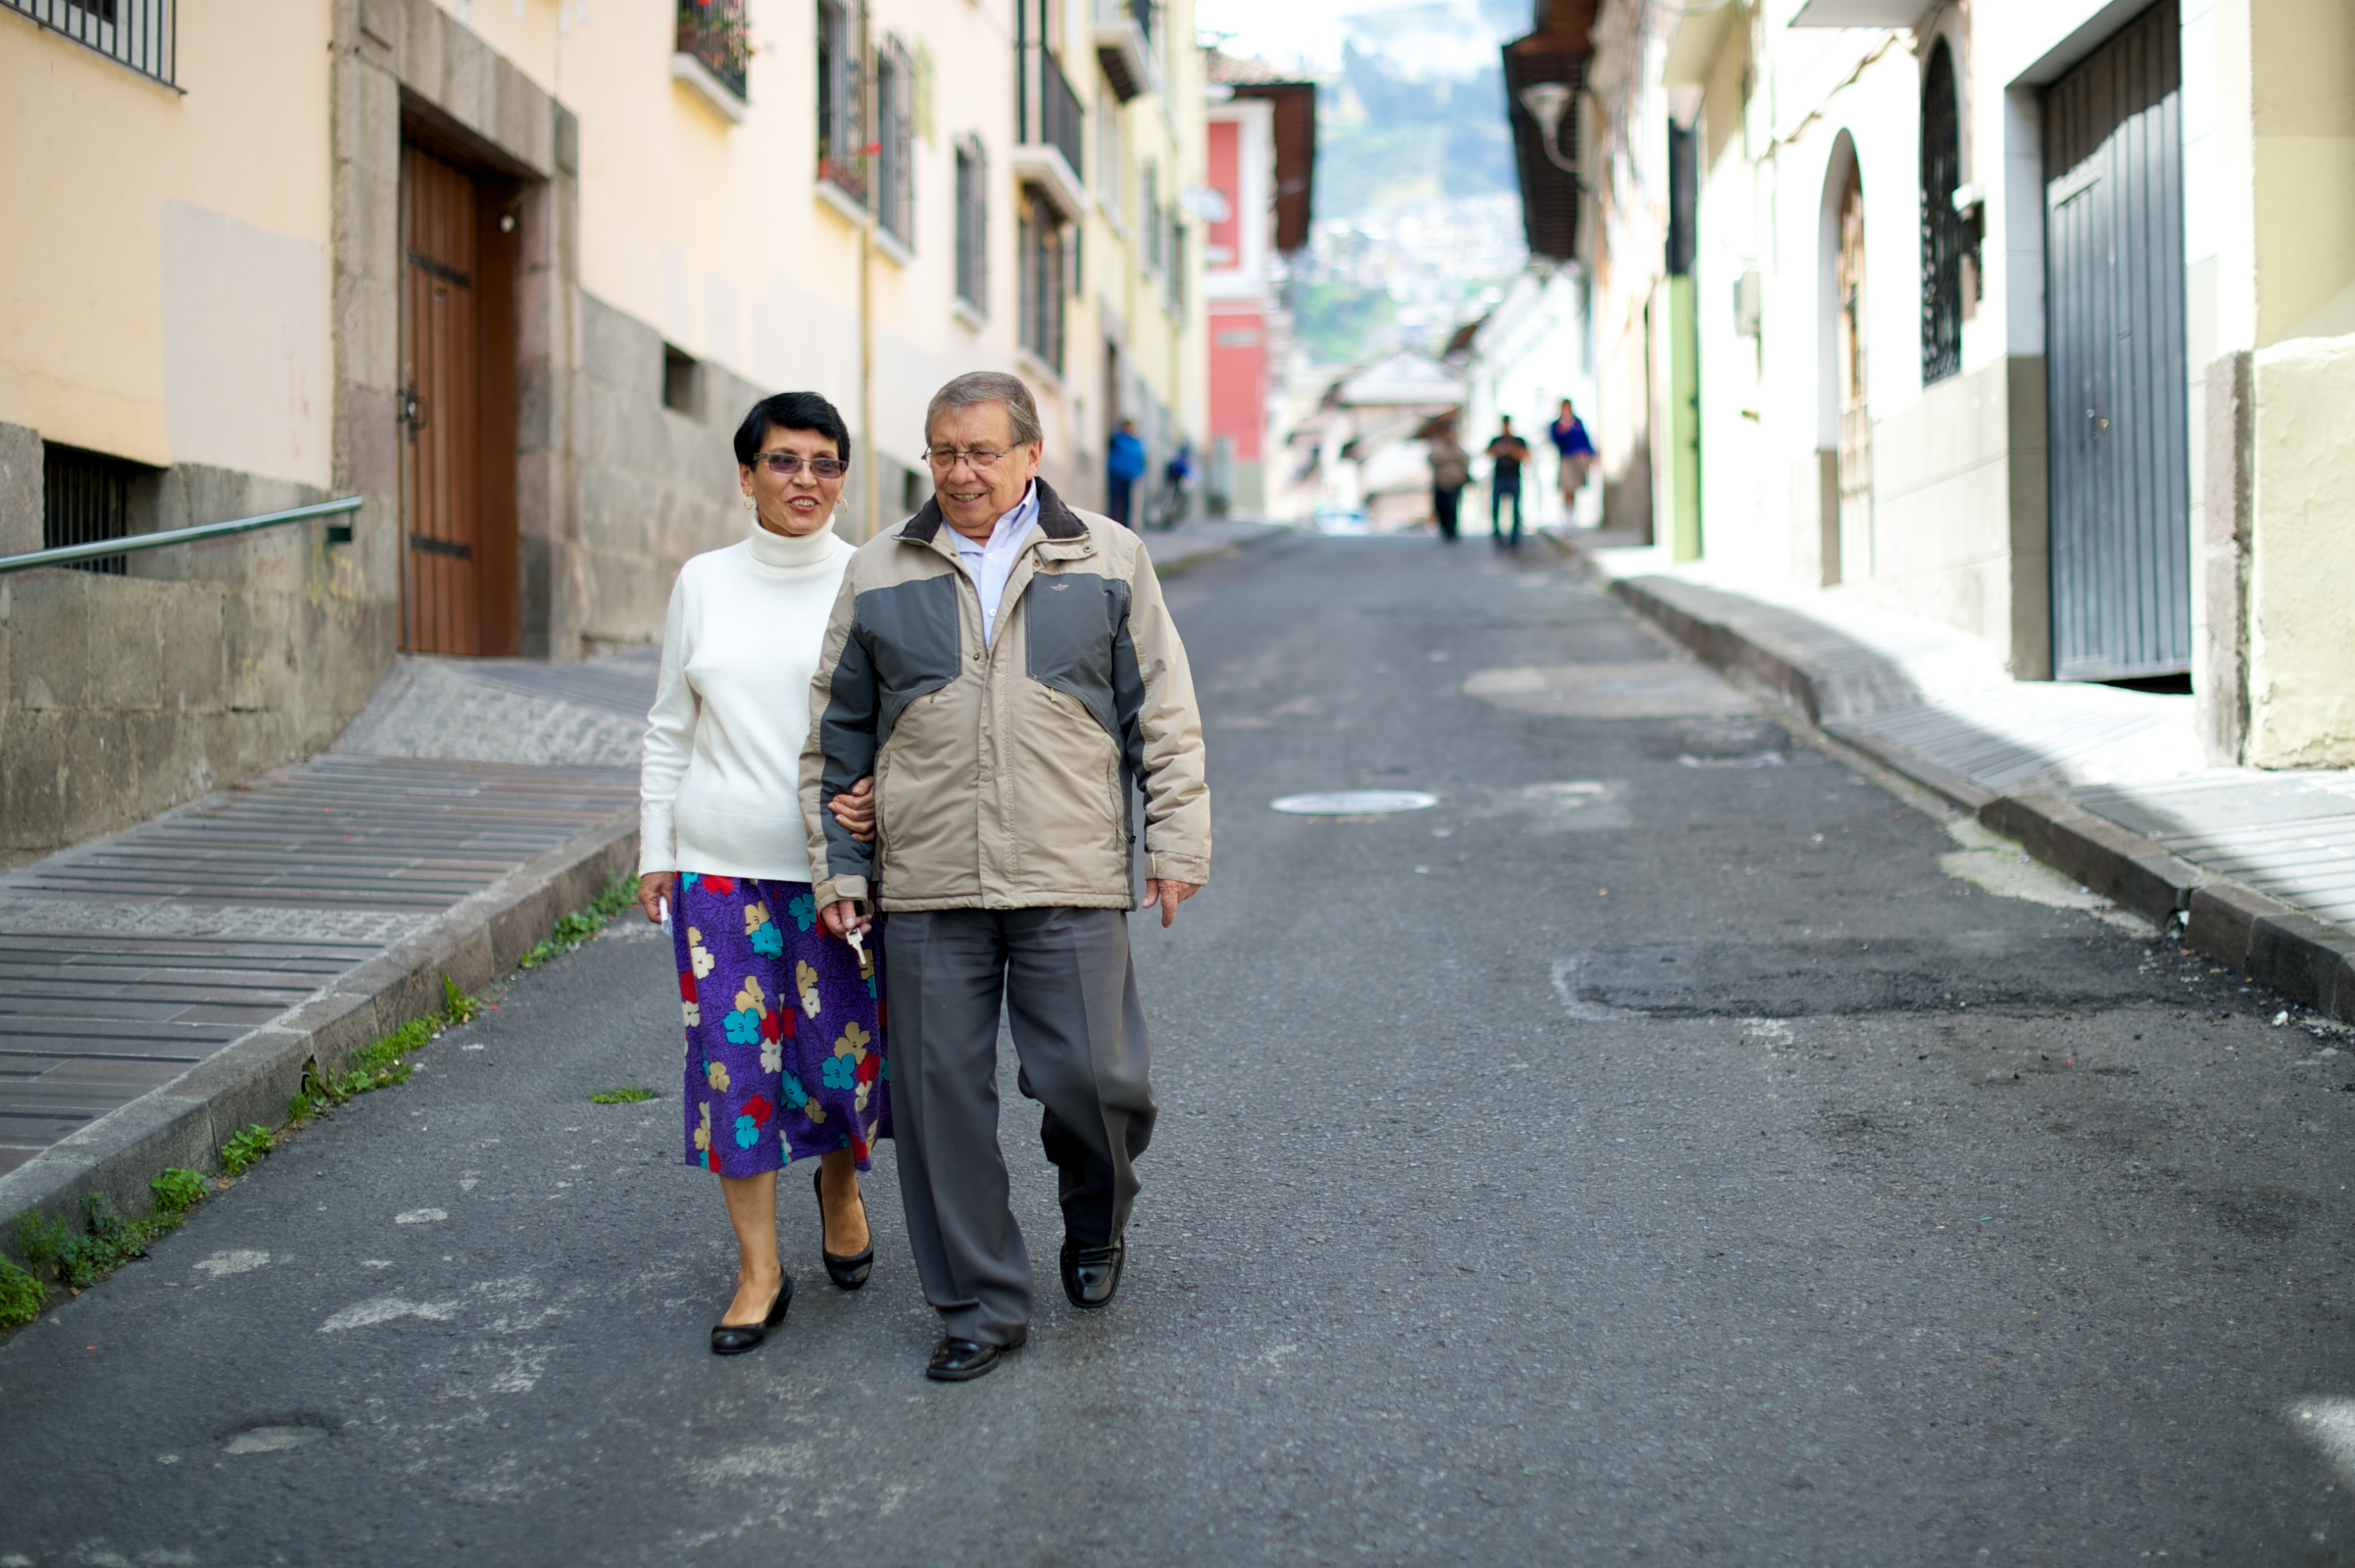 Quito Ecuador dating doven hoorzitting dating sites